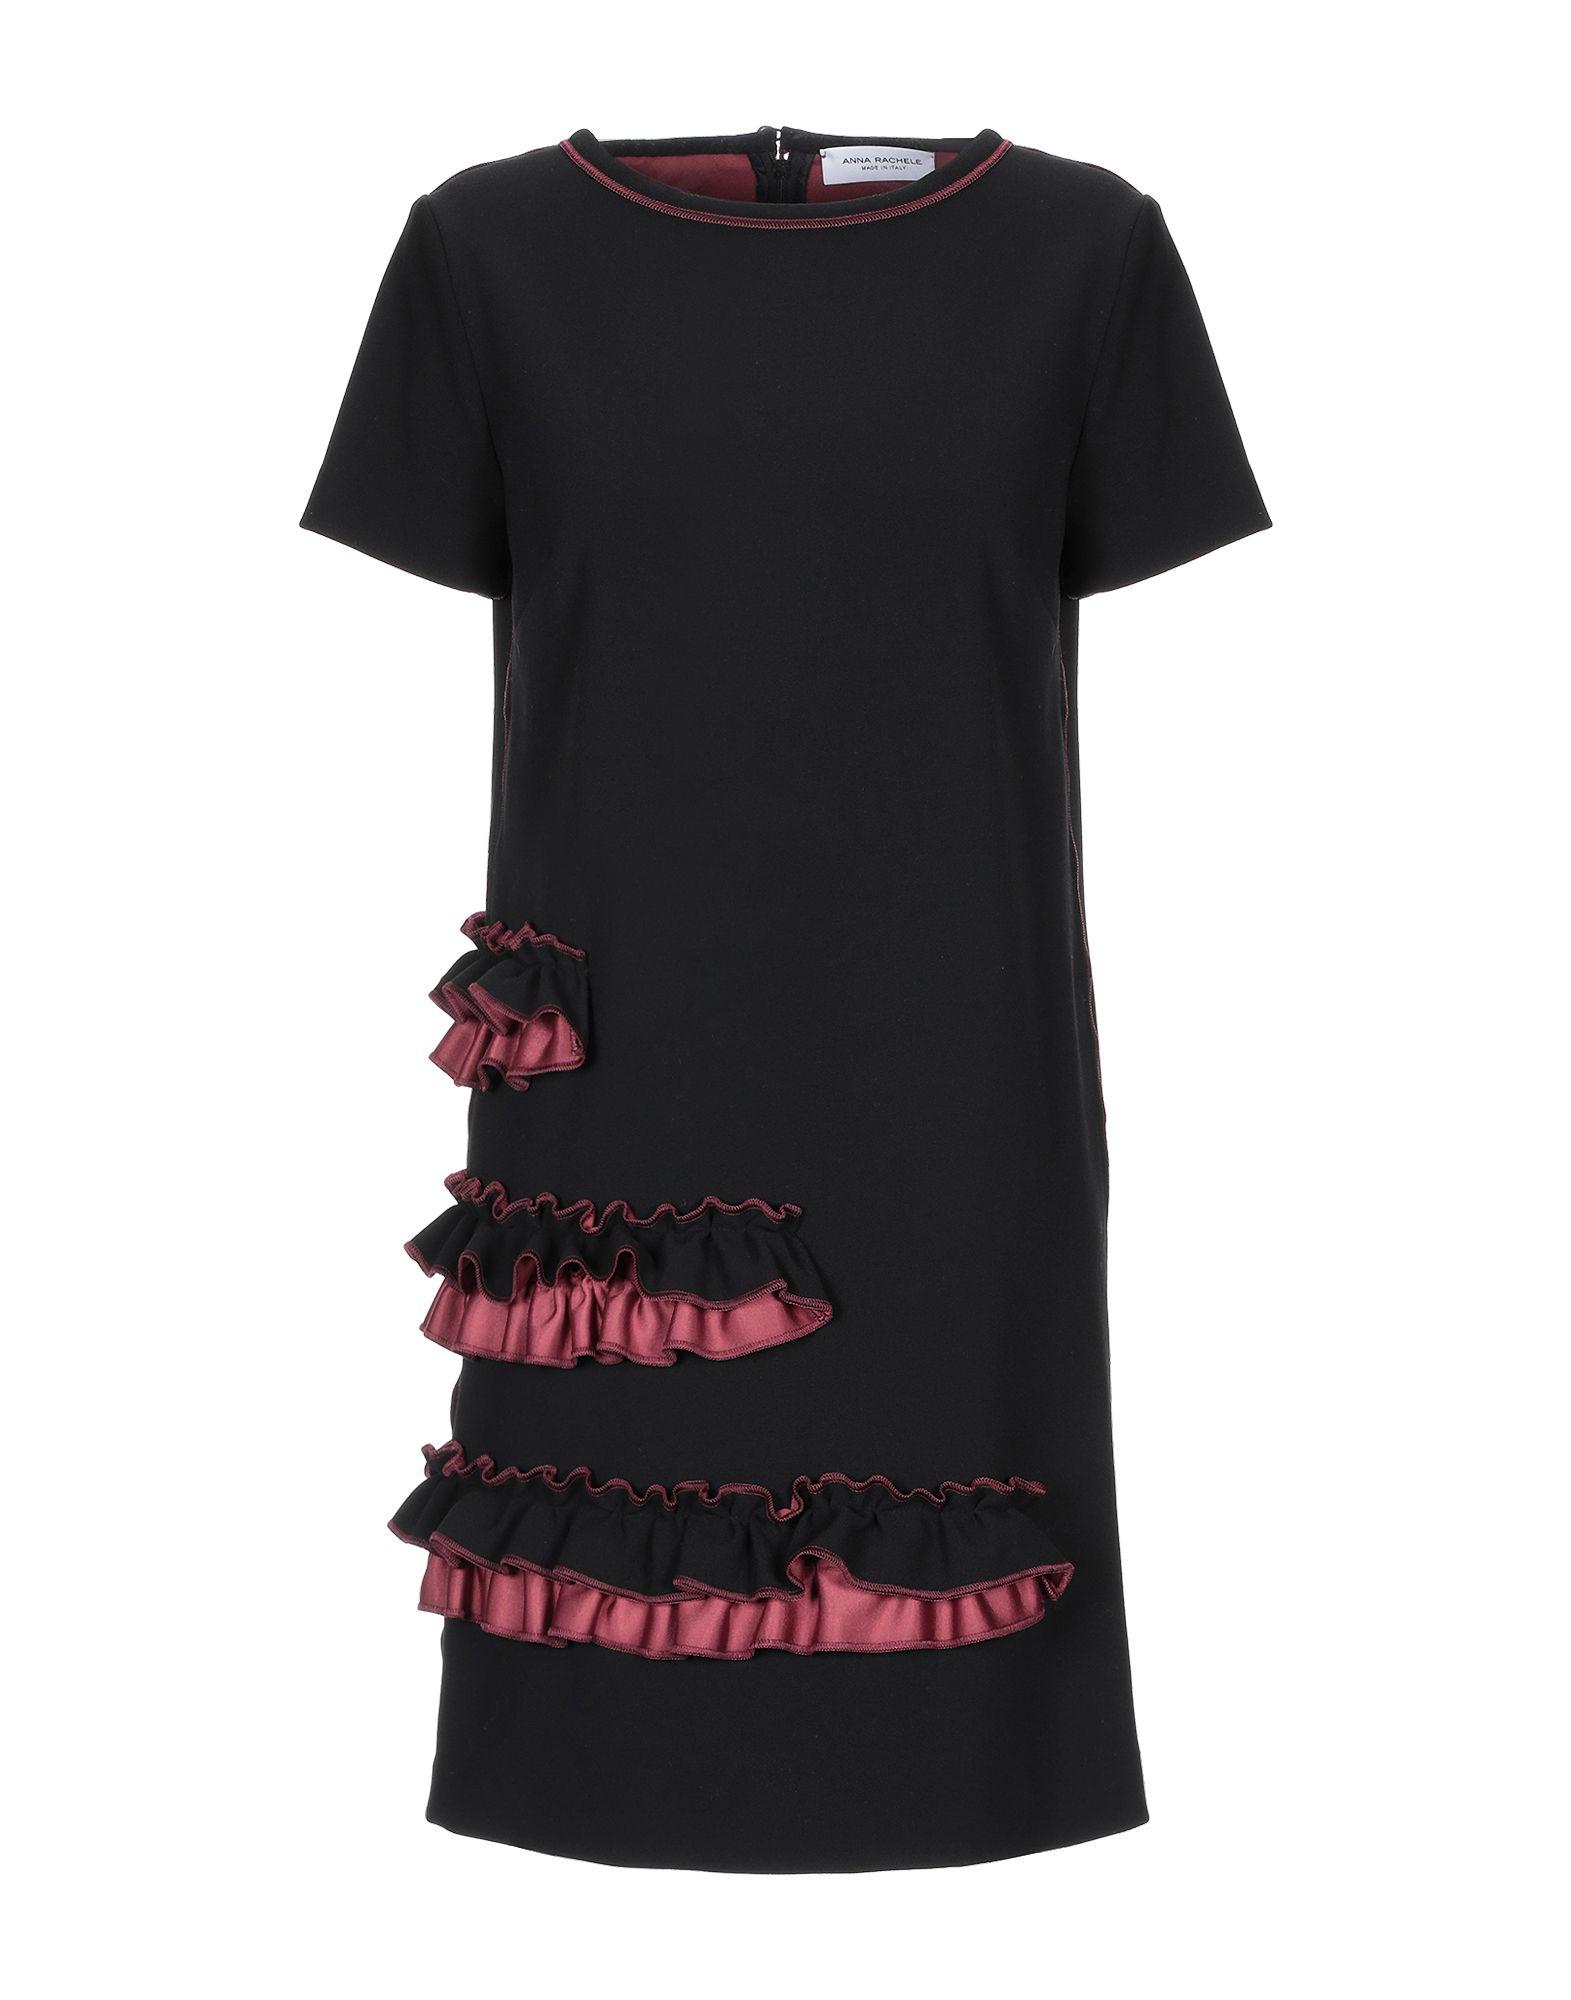 ANNA RACHELE Короткое платье платье anna rachele платья и сарафаны мини короткие